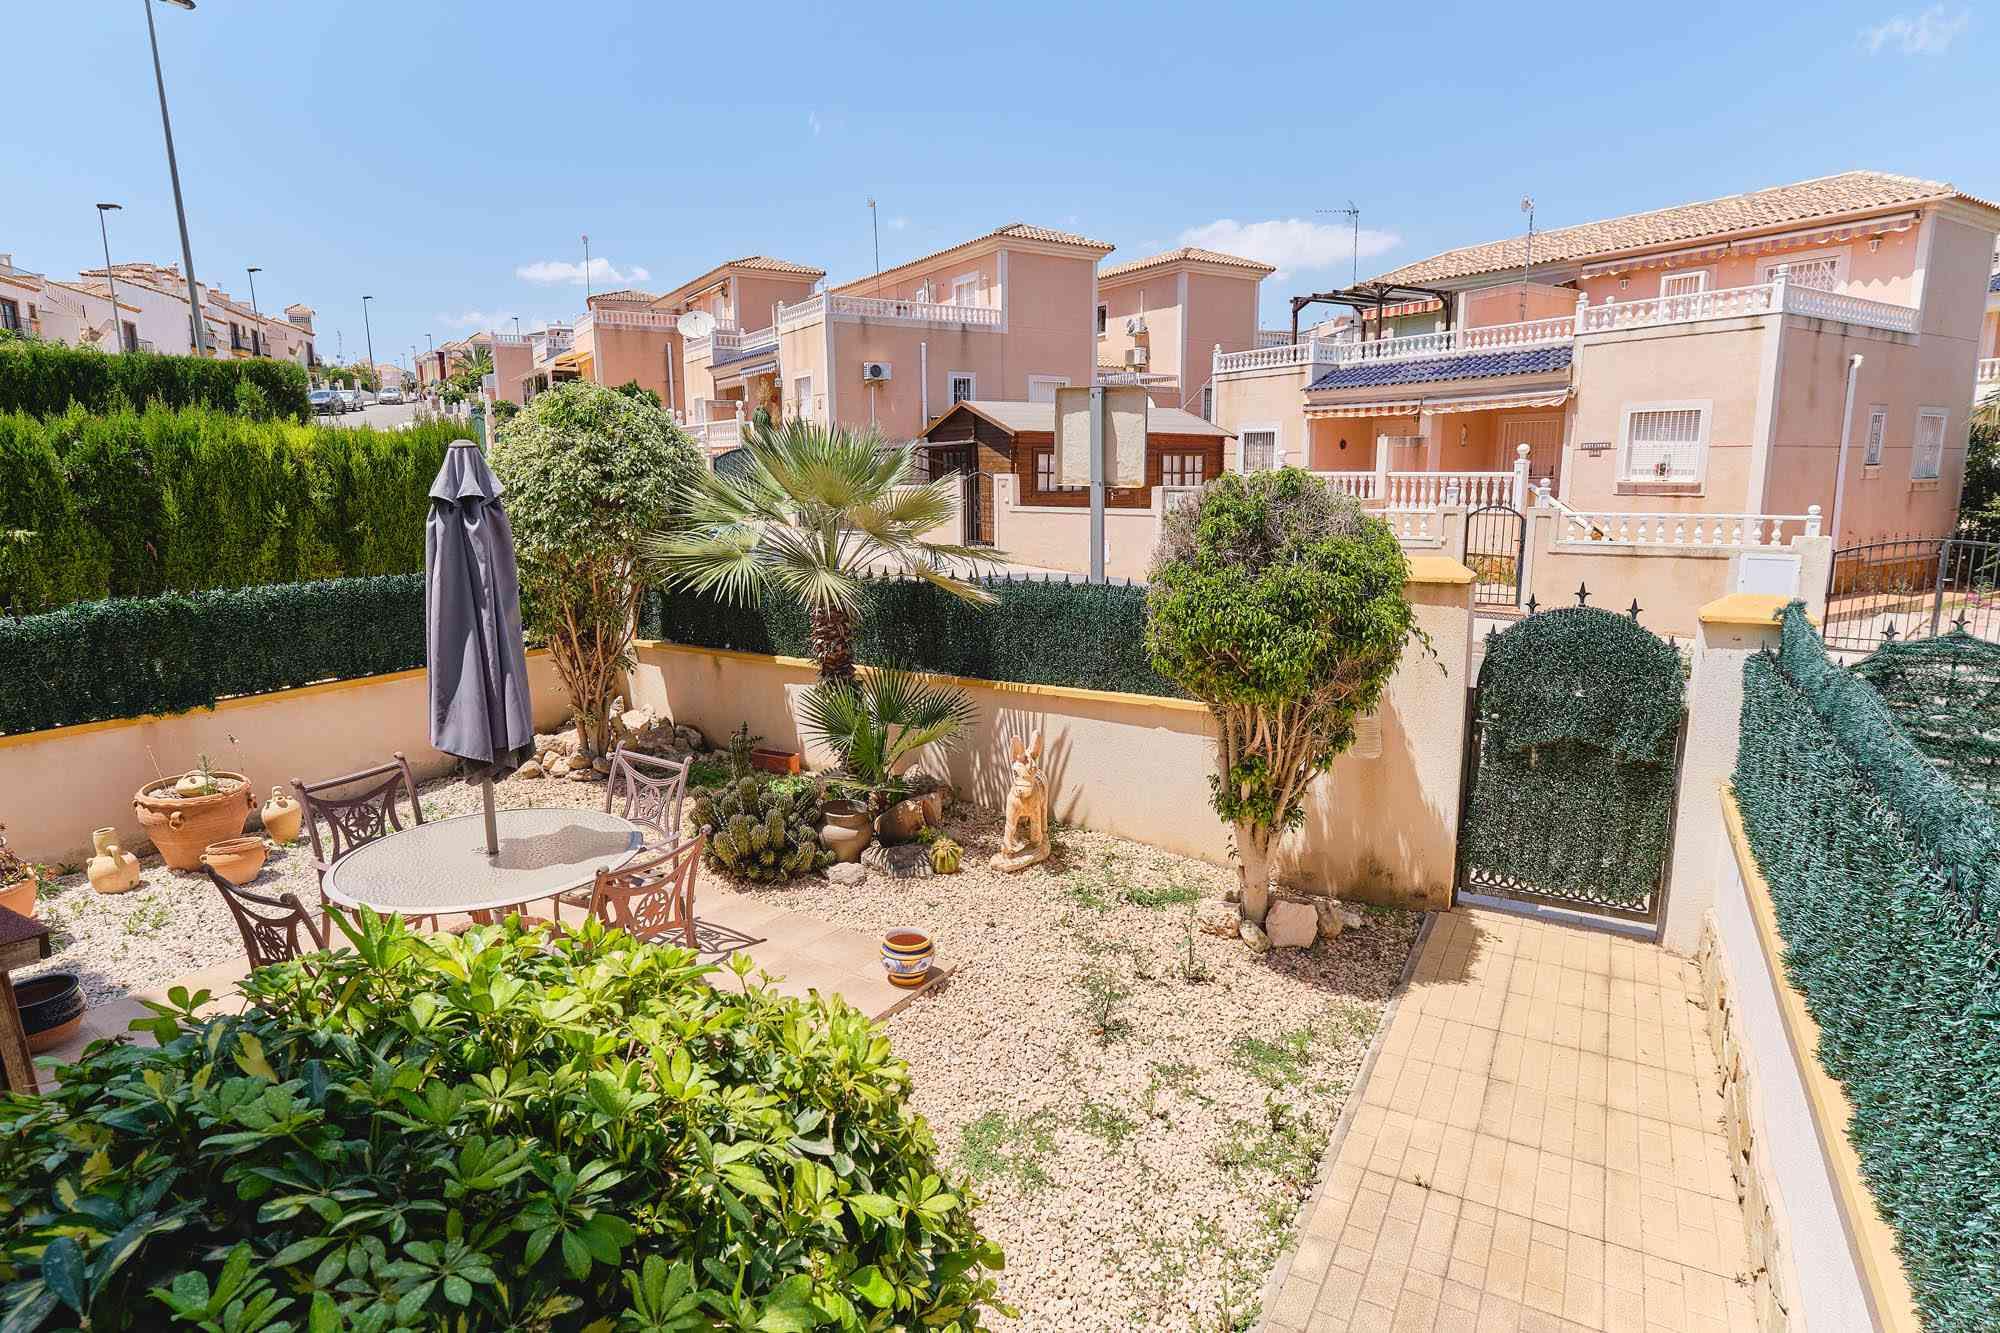 For sale: 2 bedroom apartment / flat in Alicante City, Costa Blanca